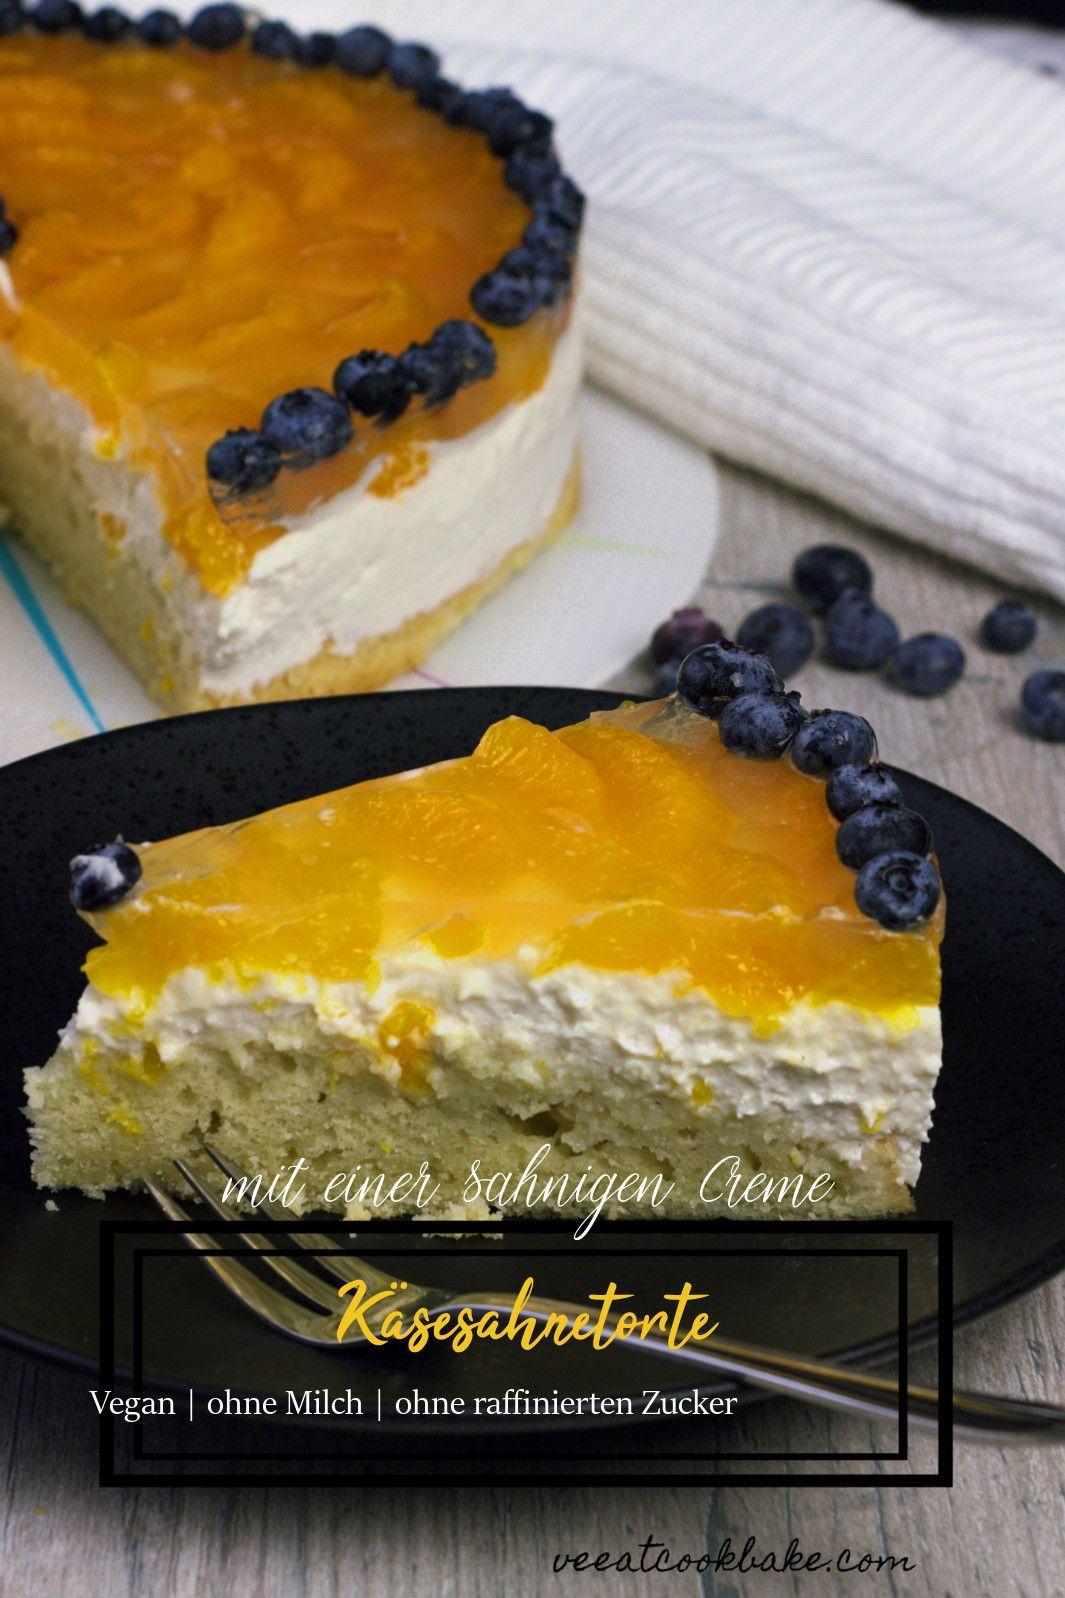 Vegane Mandarinen Quark Sahne Torte Rezept Kuchen Co Vegan